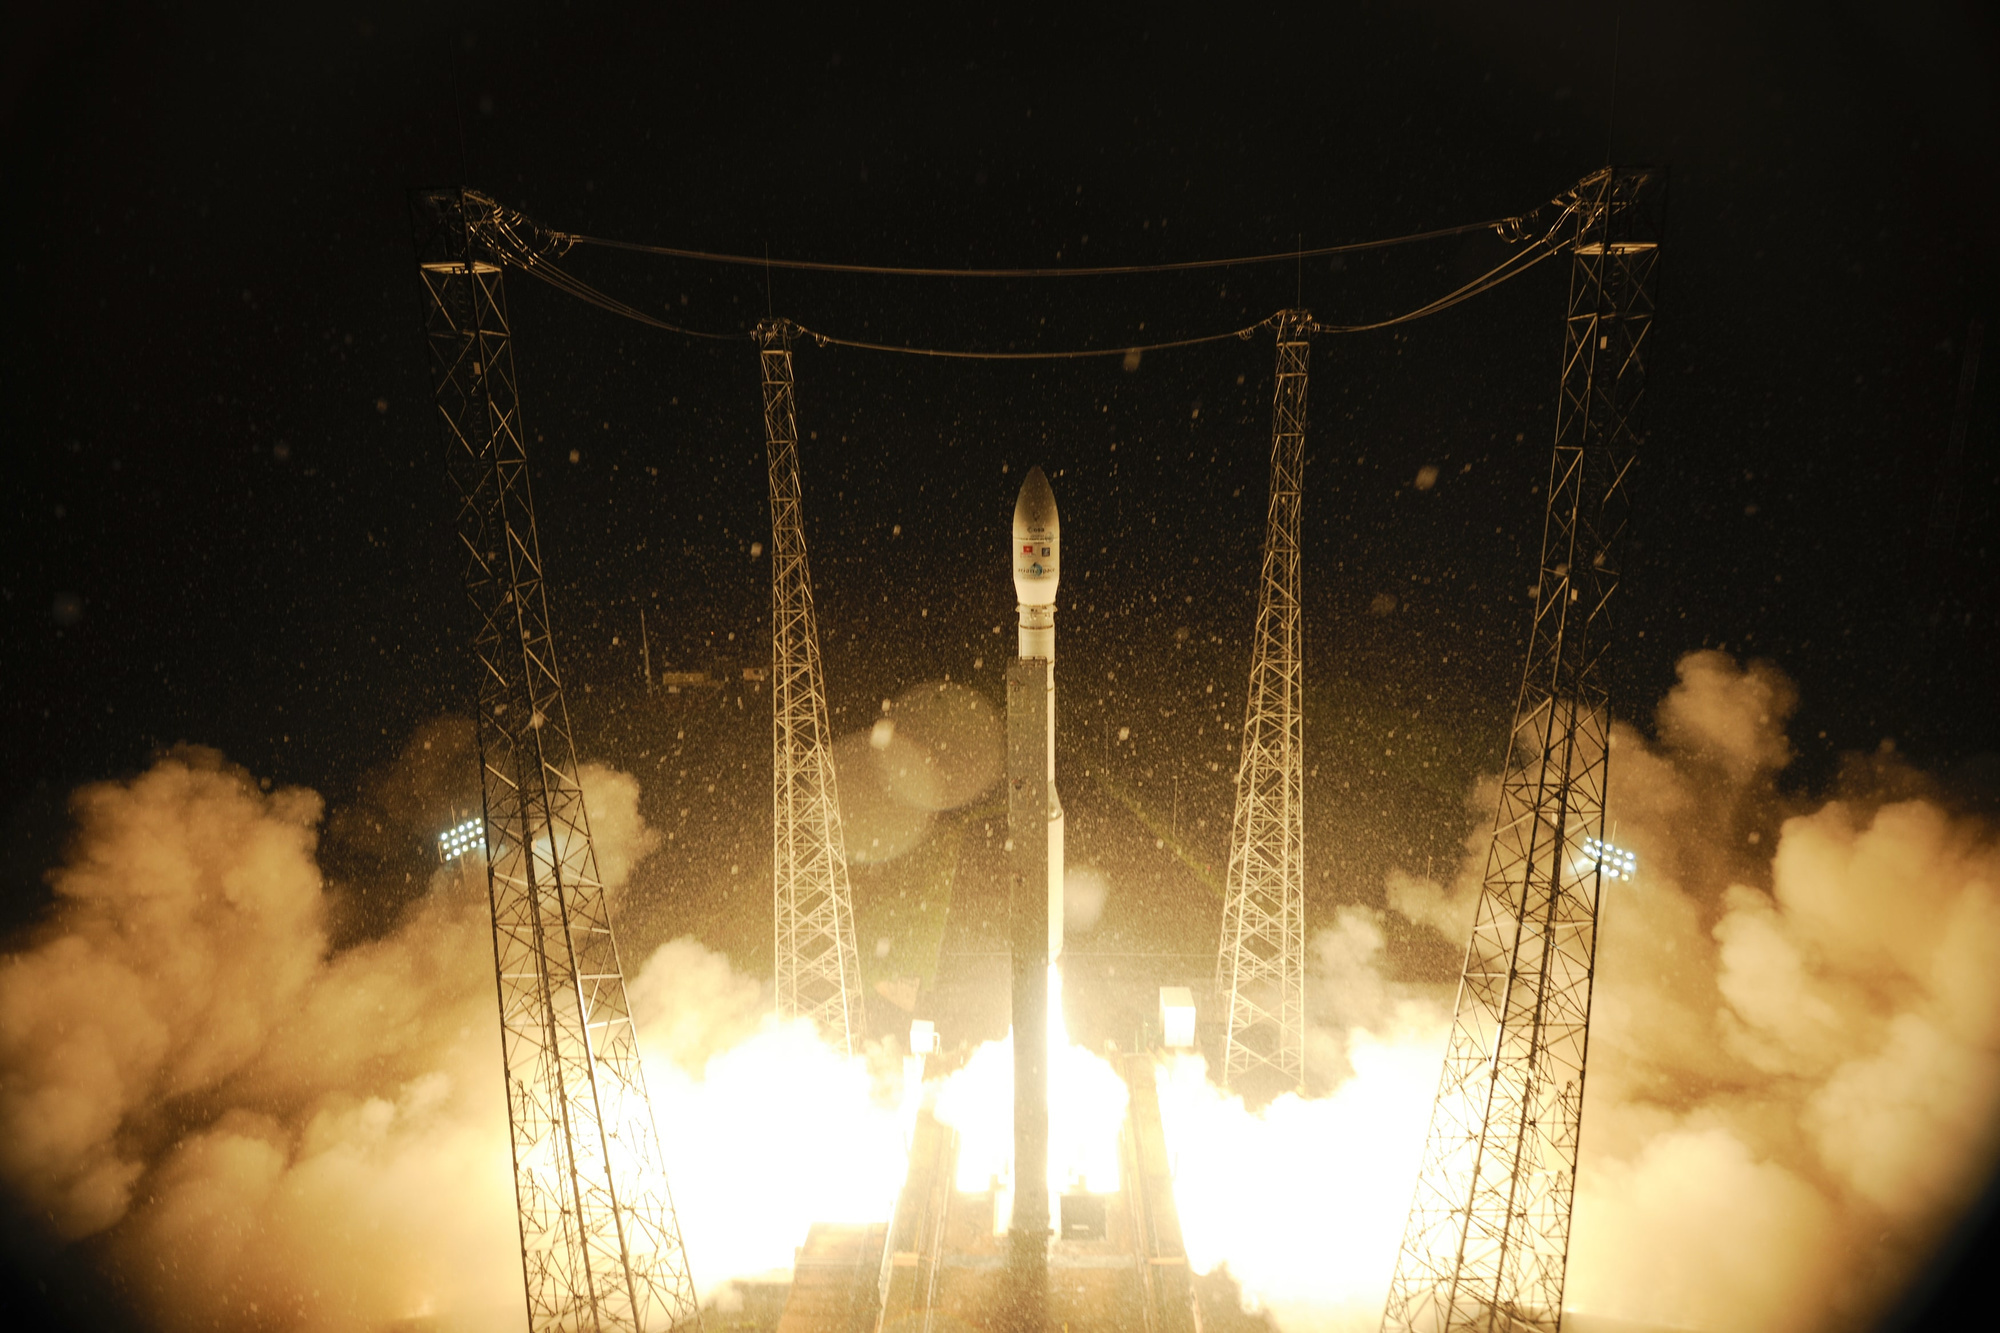 De lancering van de PROBA-V in 2013., ESA-S.Corvaja